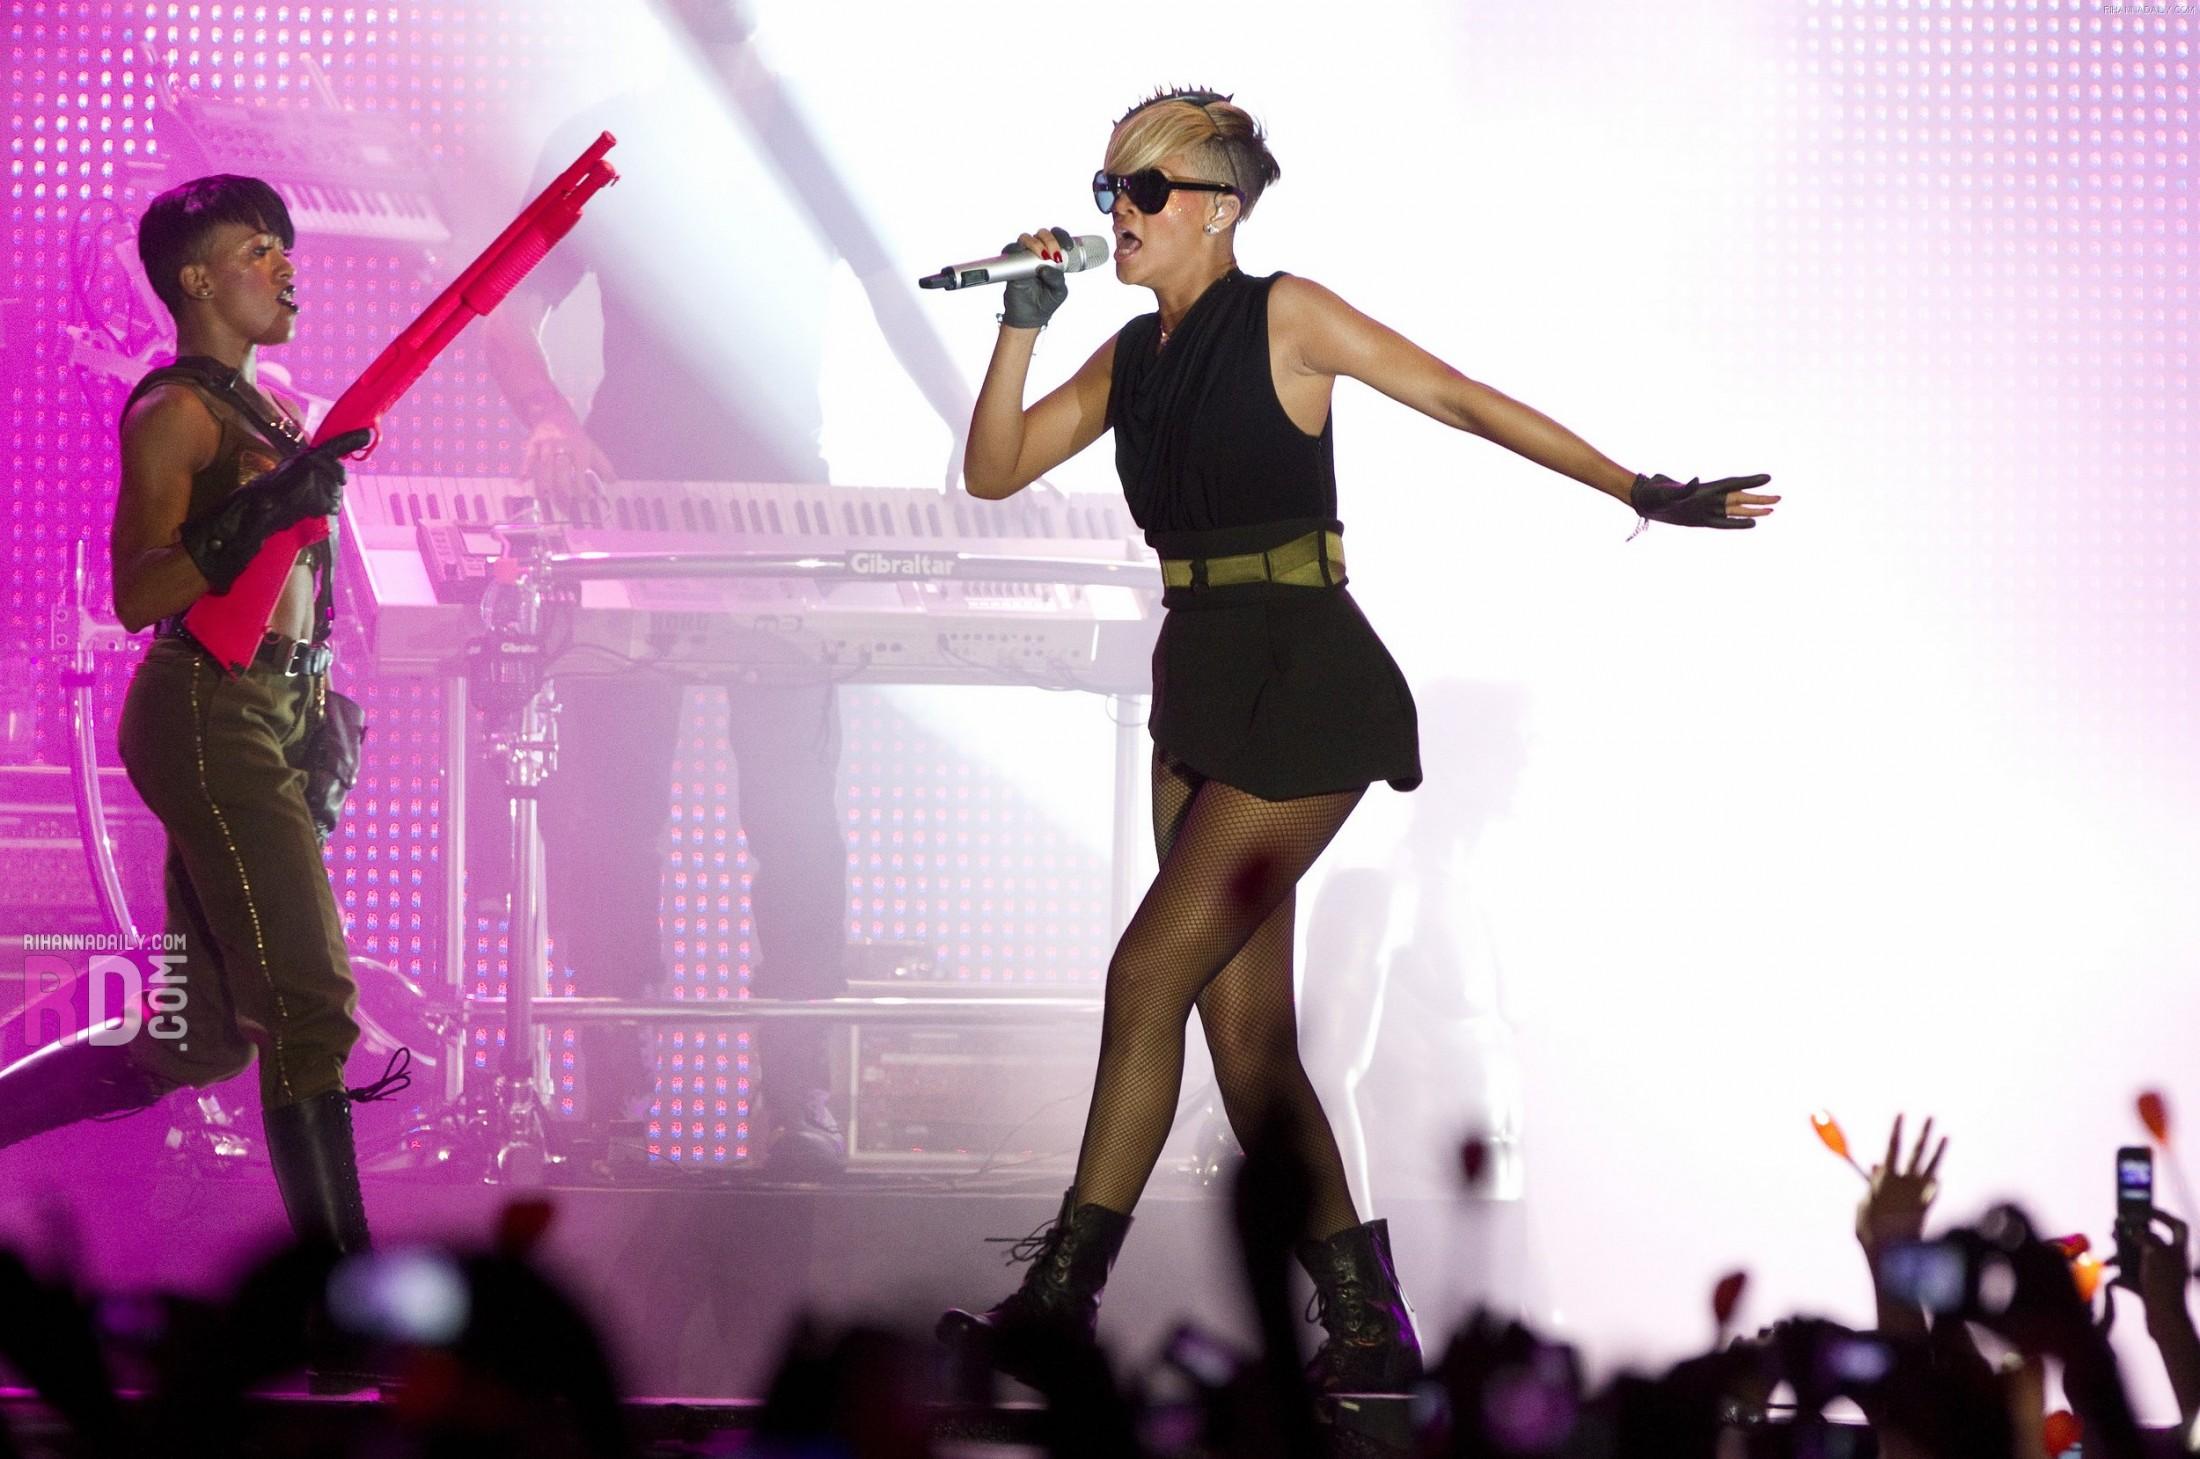 Rihanna 2010 : rihanna-performance-pics-in-tel-aviv-may-2010-10